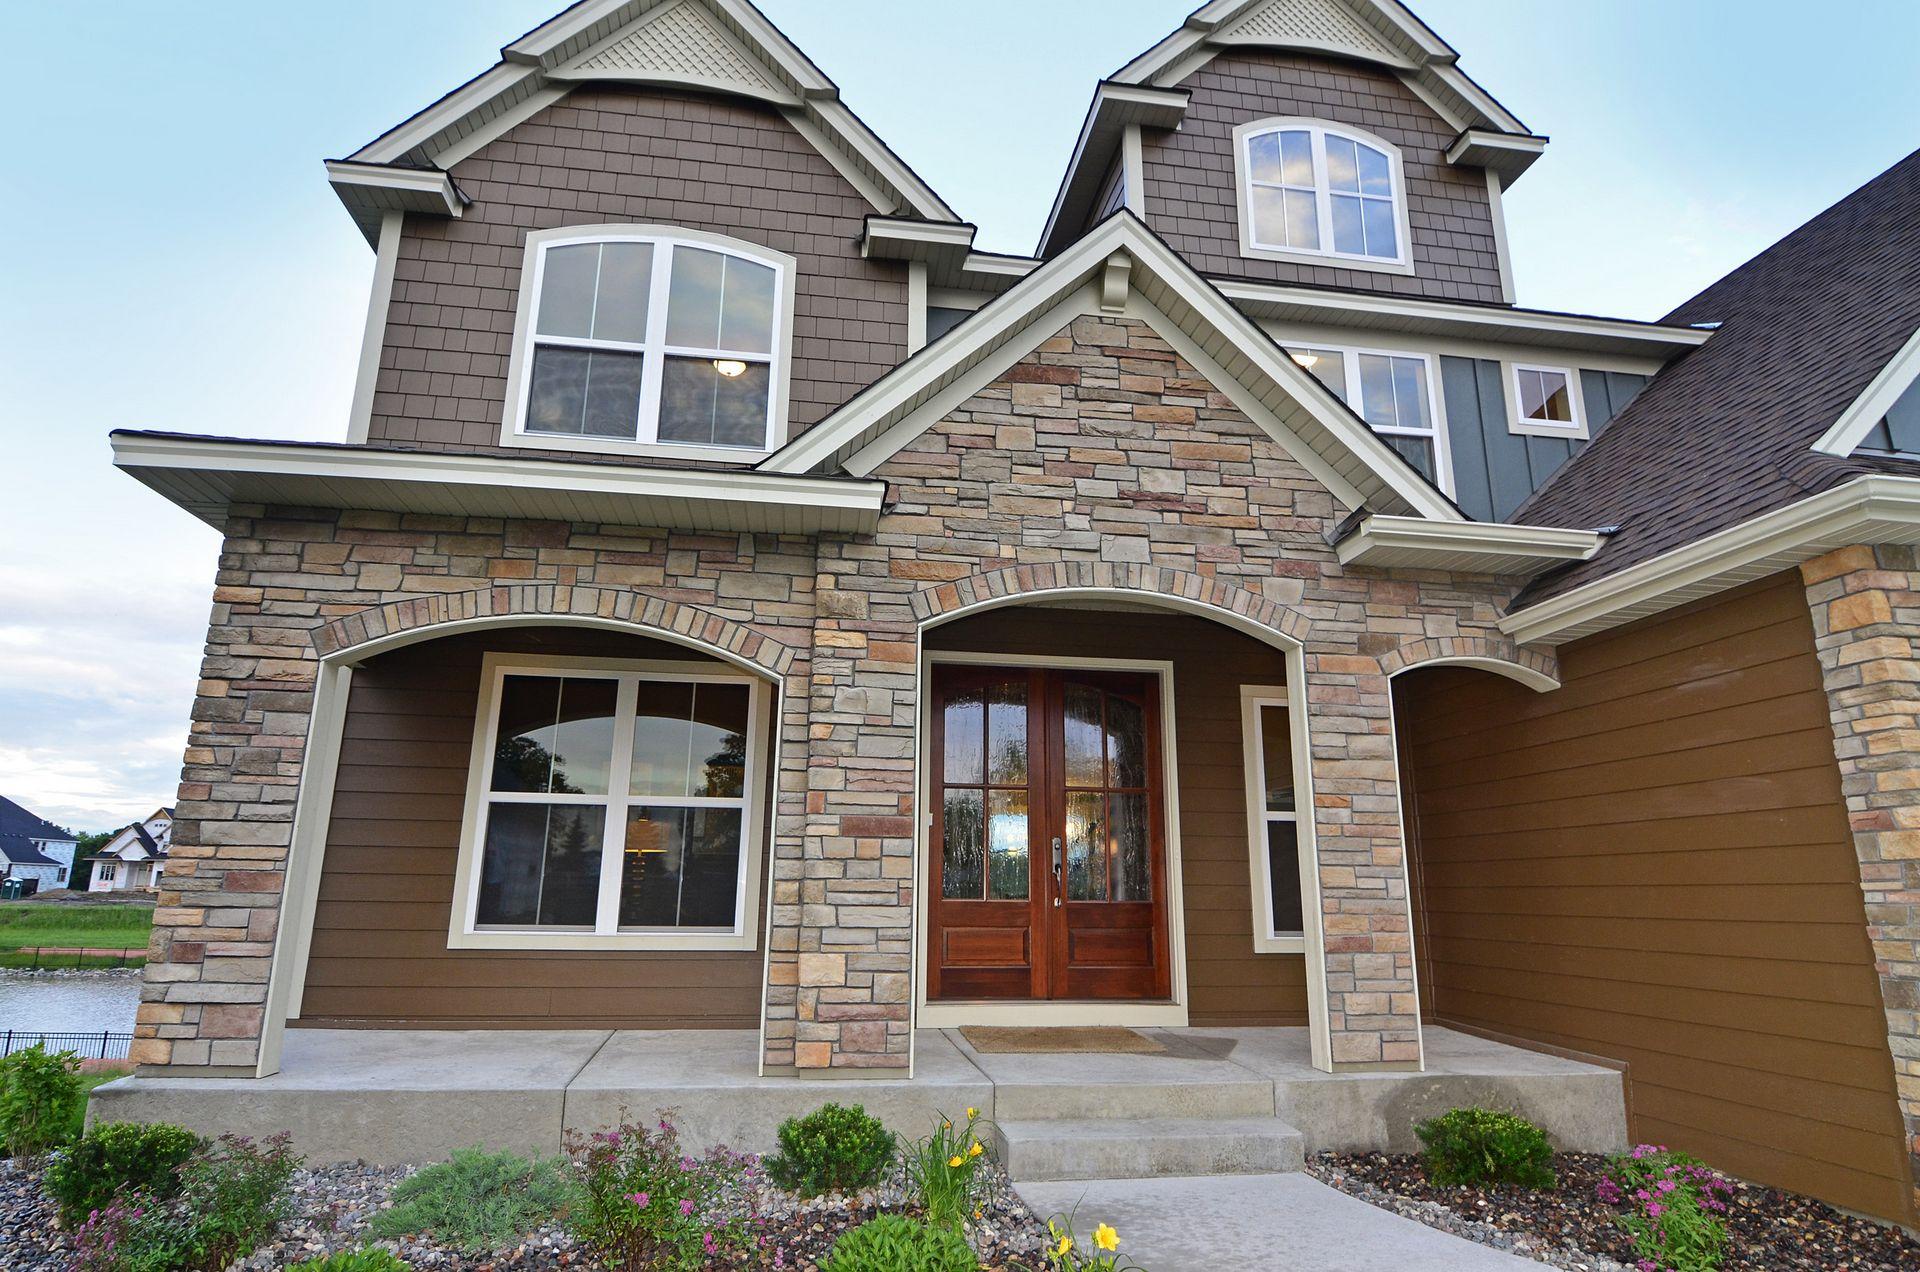 Storybook Craftsman House Plans - 28 Exclusive